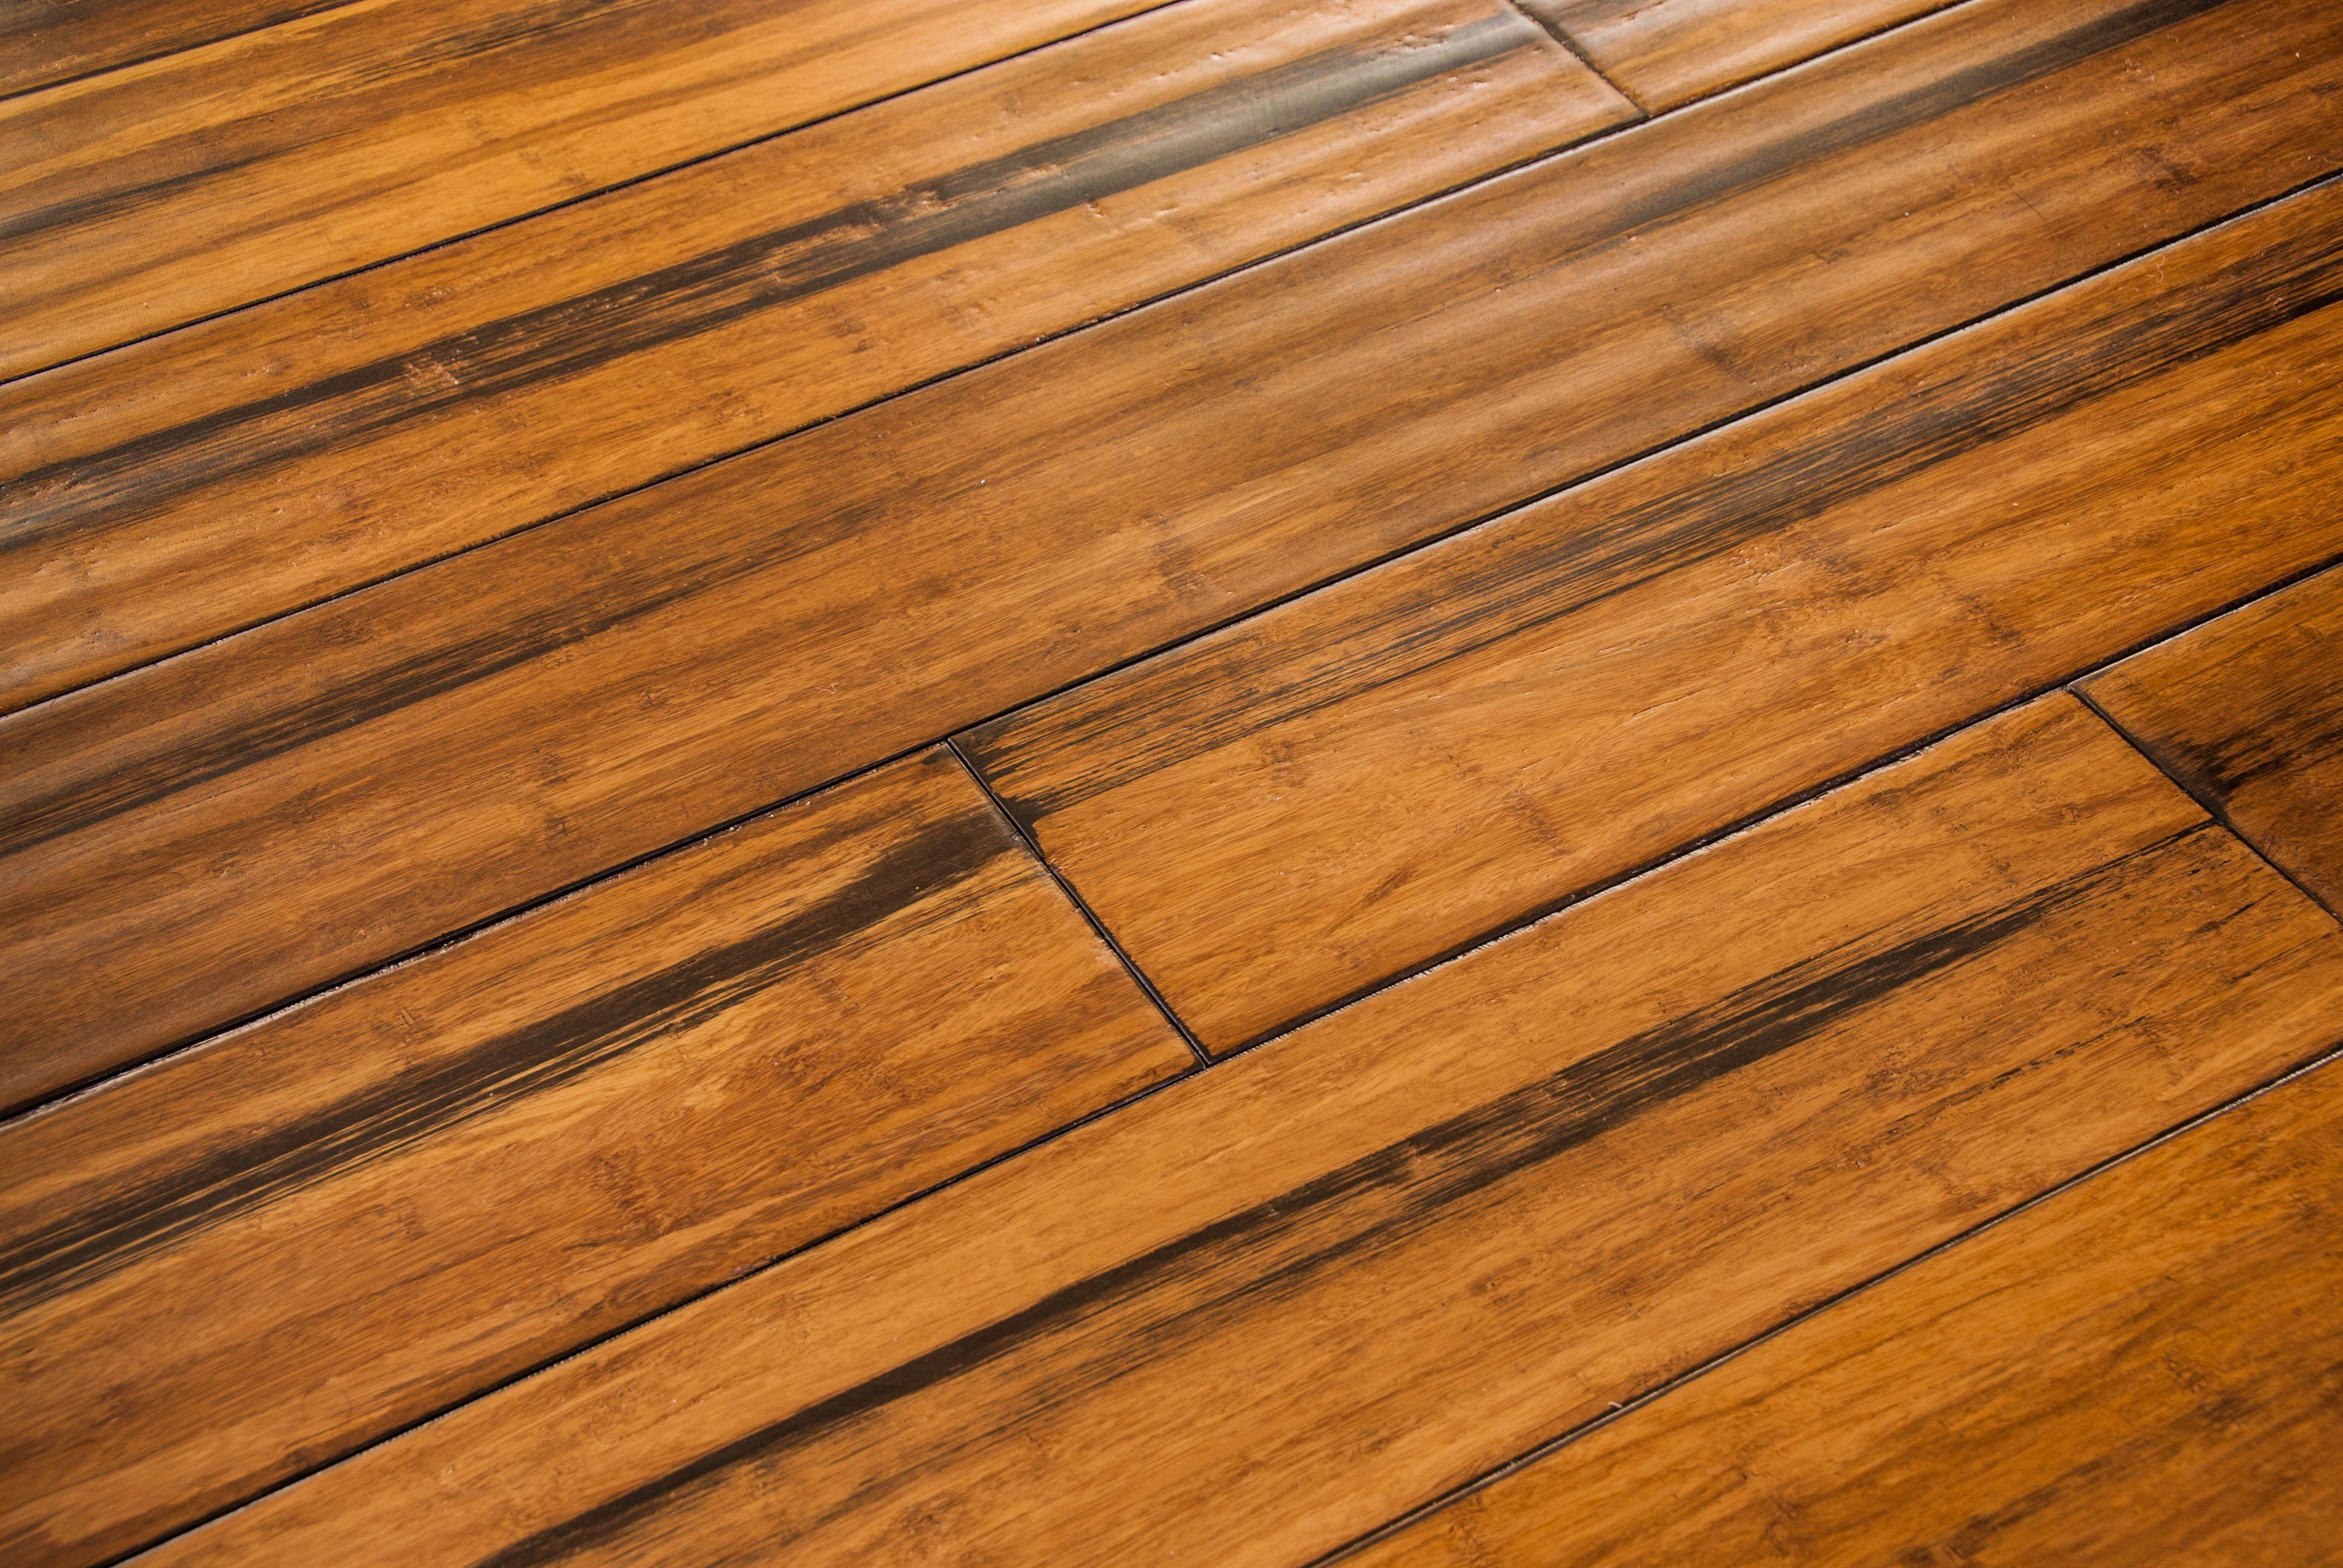 Bamboo Hardwood Flooring Bamboo hardwood flooring